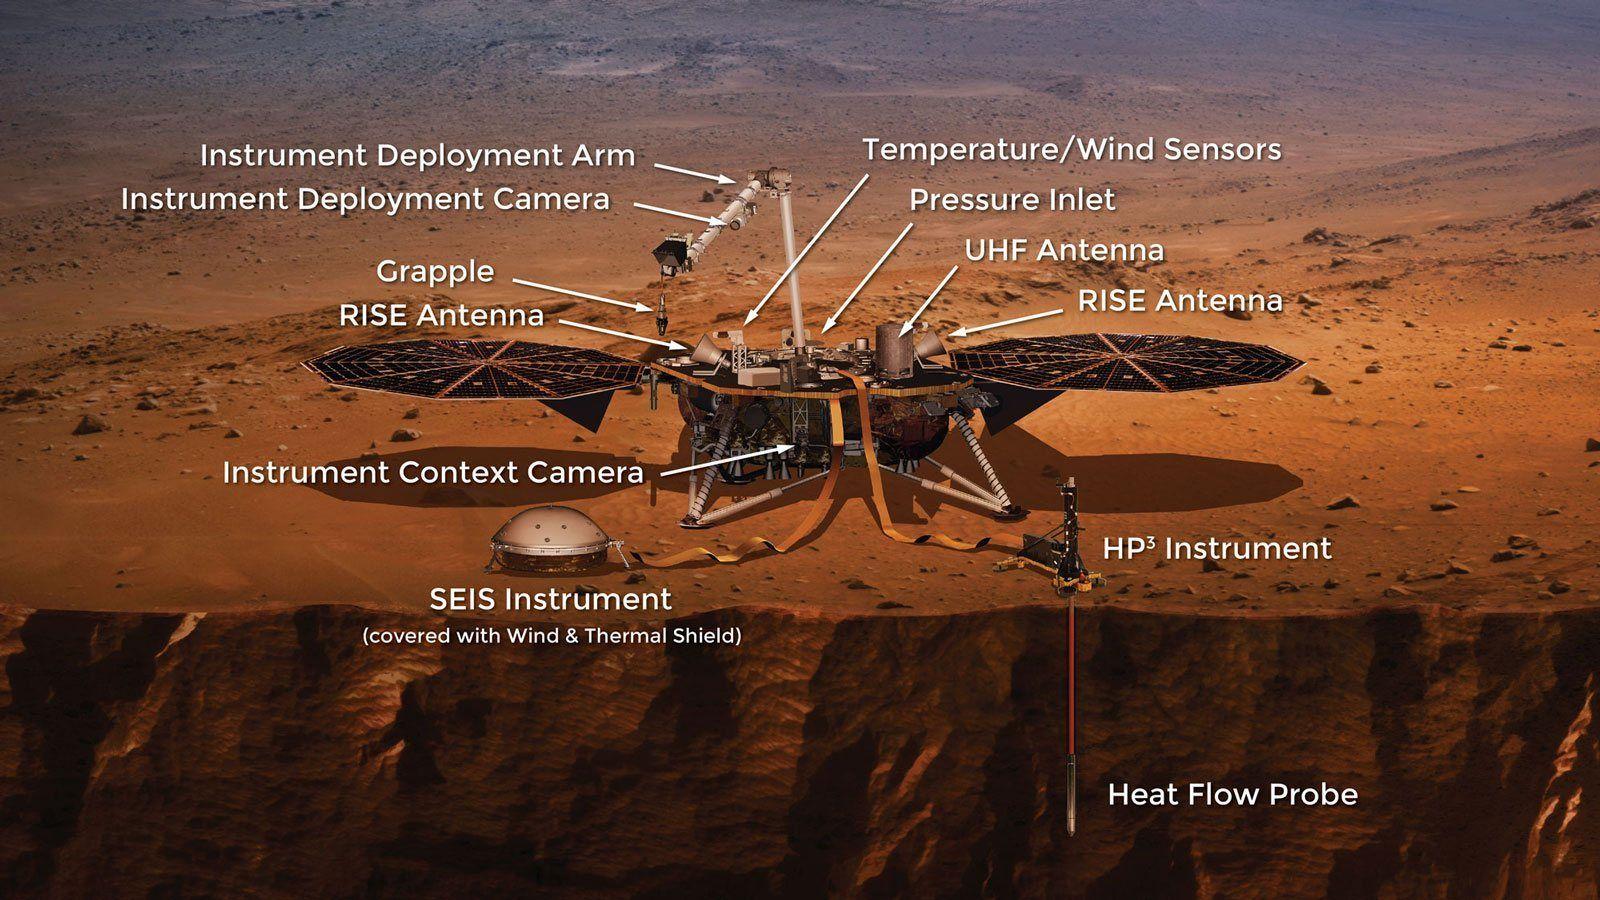 Slik ser InSight-farkosten ut.